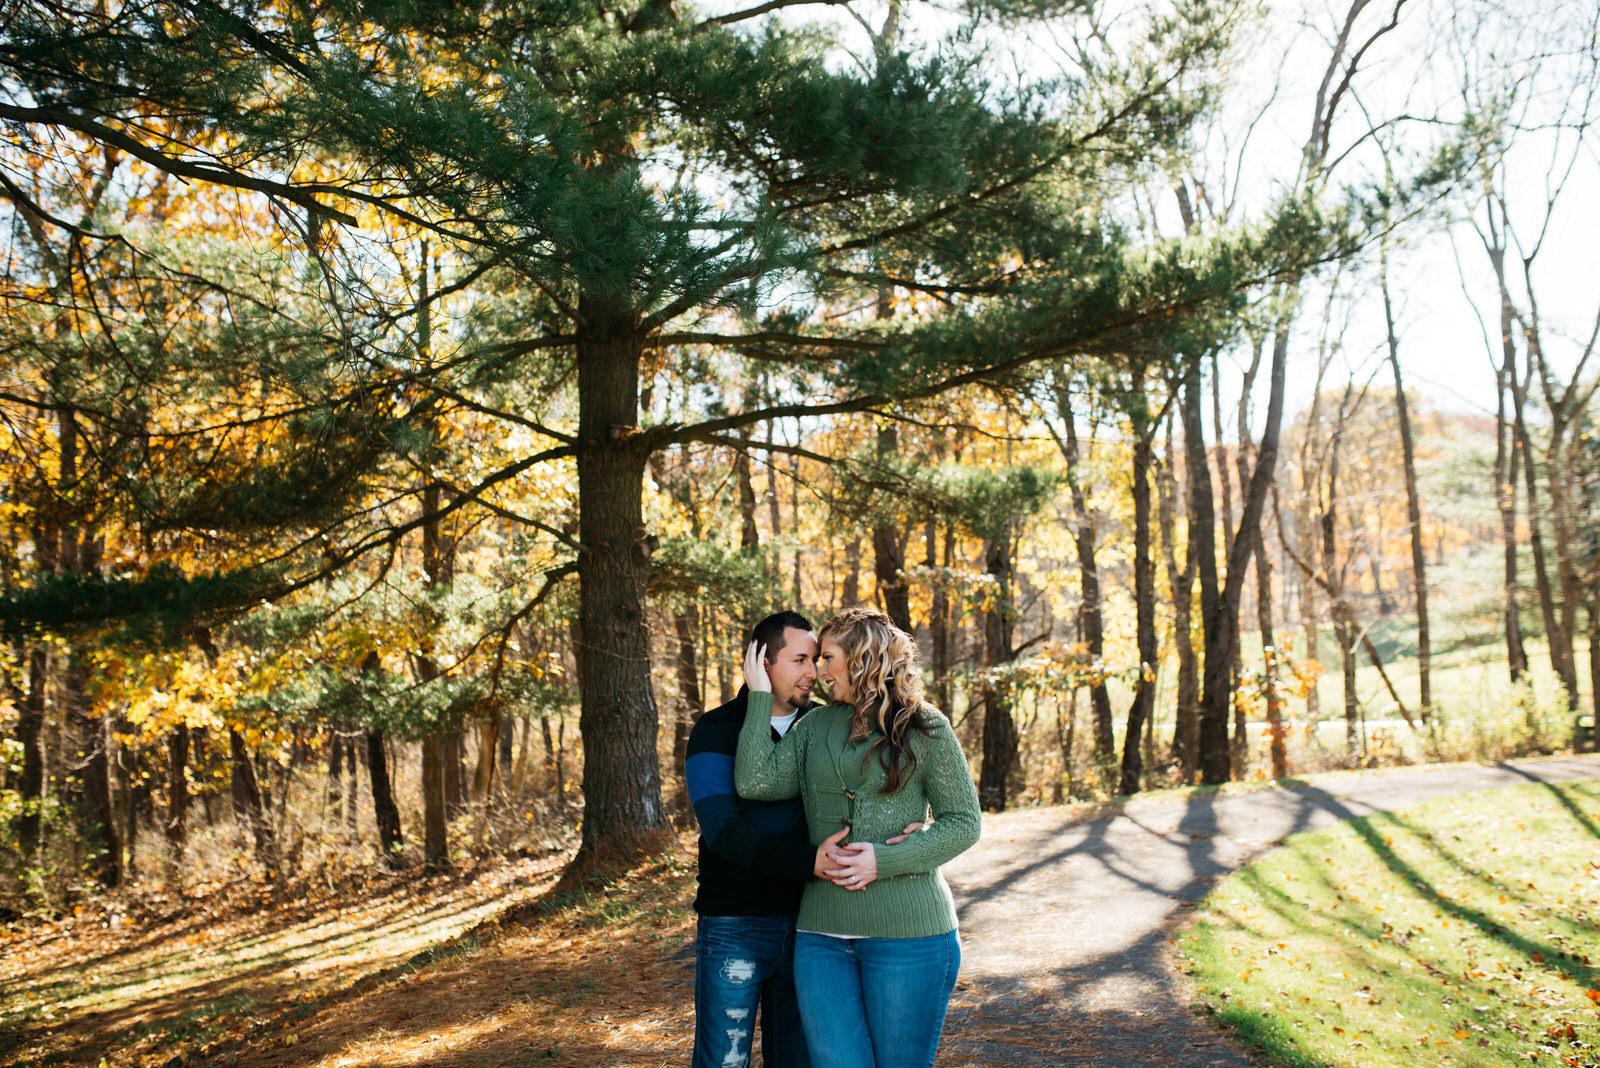 bradys-run-park-engagement-photo-037.jpg